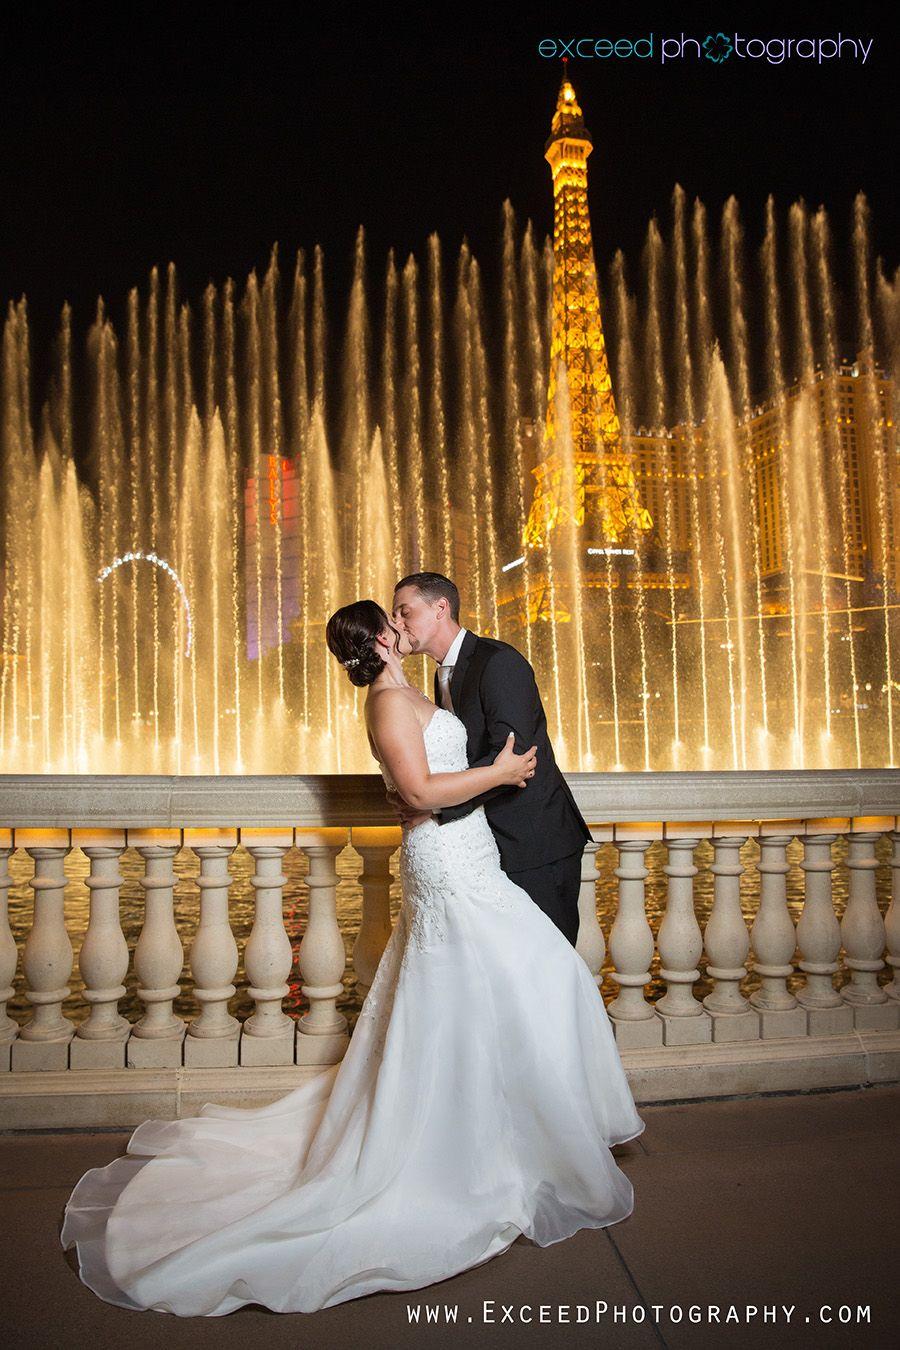 Las Vegas Strip Wedding Photo Session Margot And Patrick Event Photographer